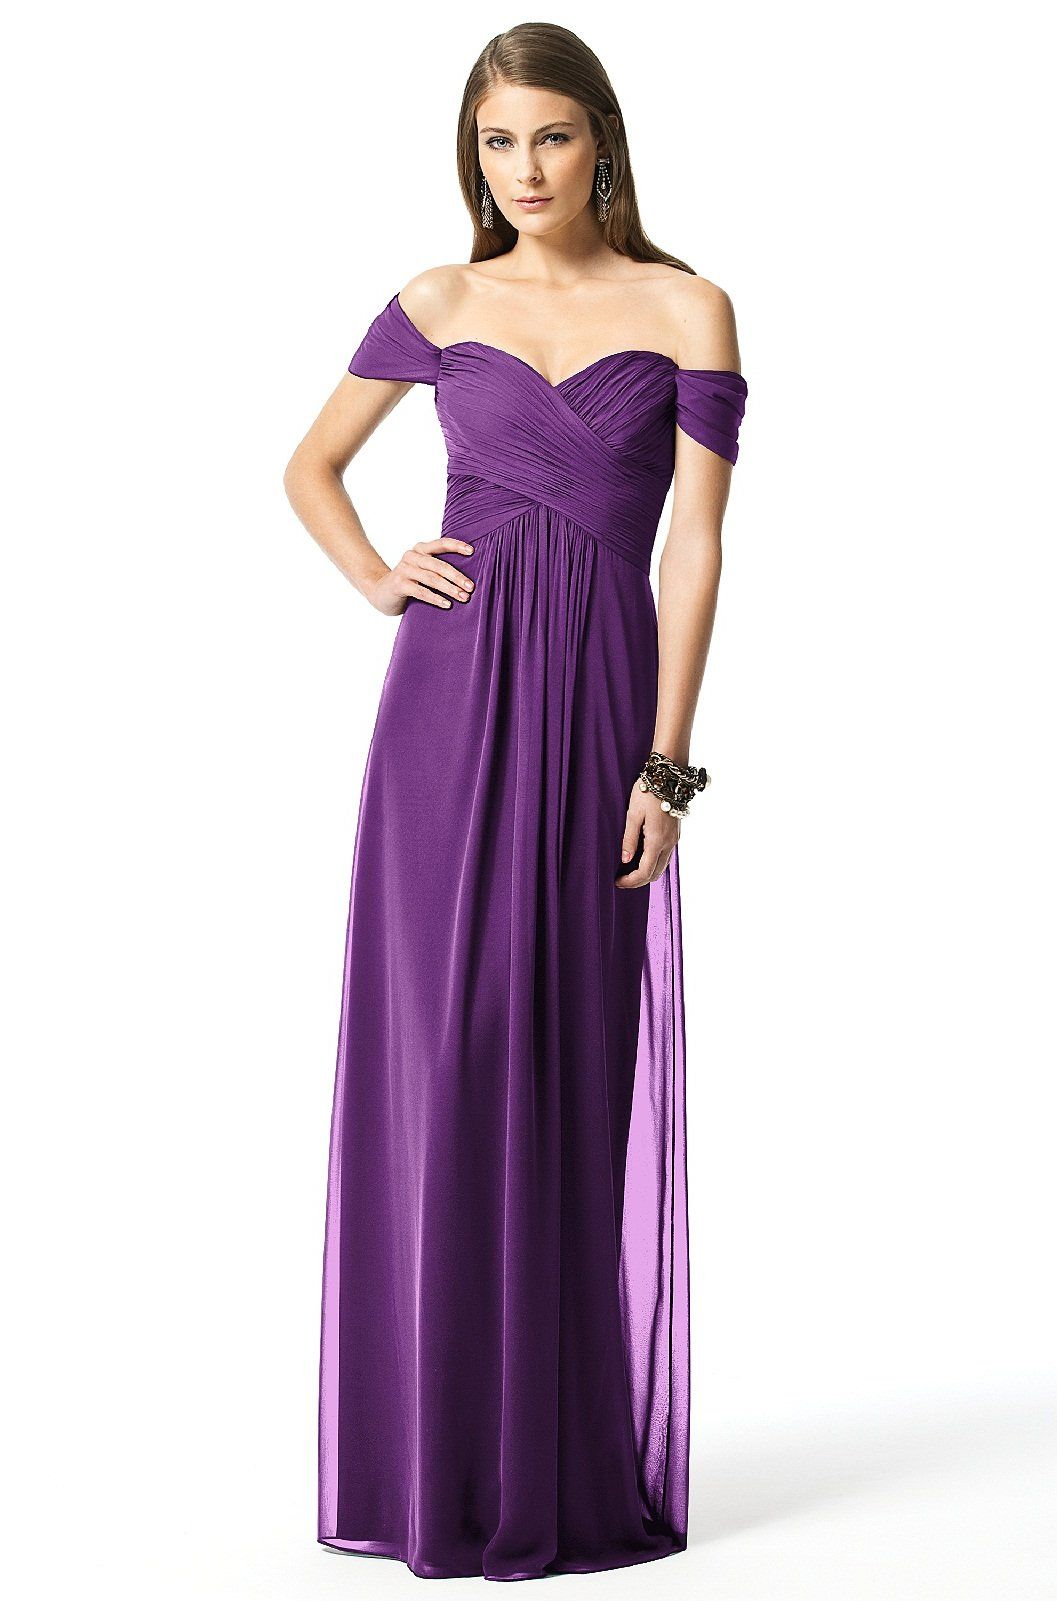 Dessy 2844 Bridesmaid Dress | Weddington Way | Brittany wedding ...